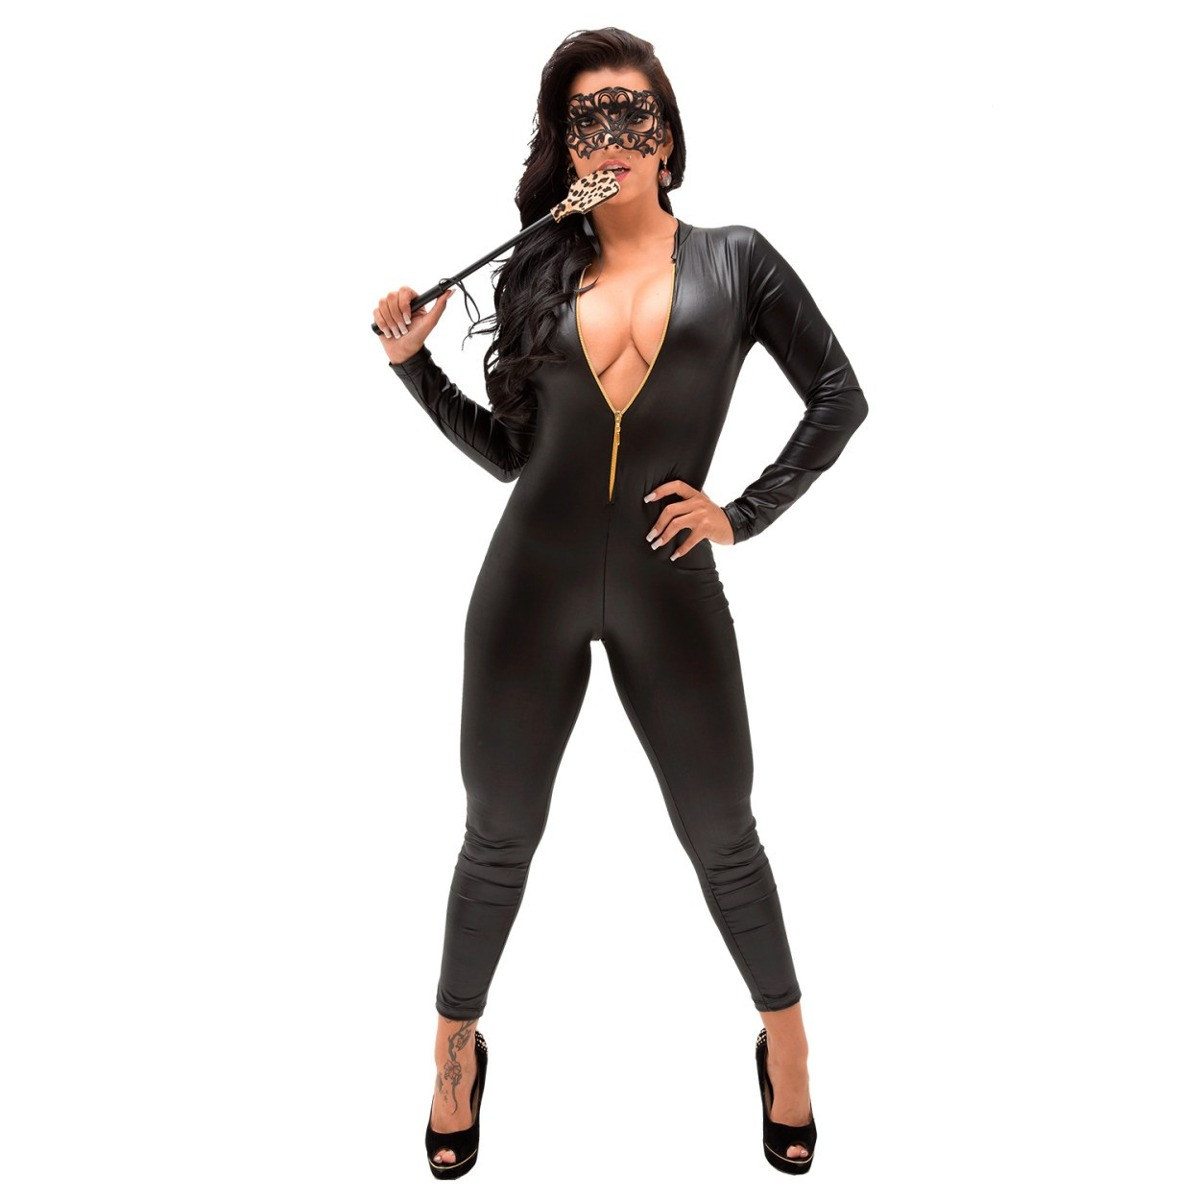 Fantasia sexy da mulher gato [PUNIQRANDLINE-(au-dating-names.txt) 43